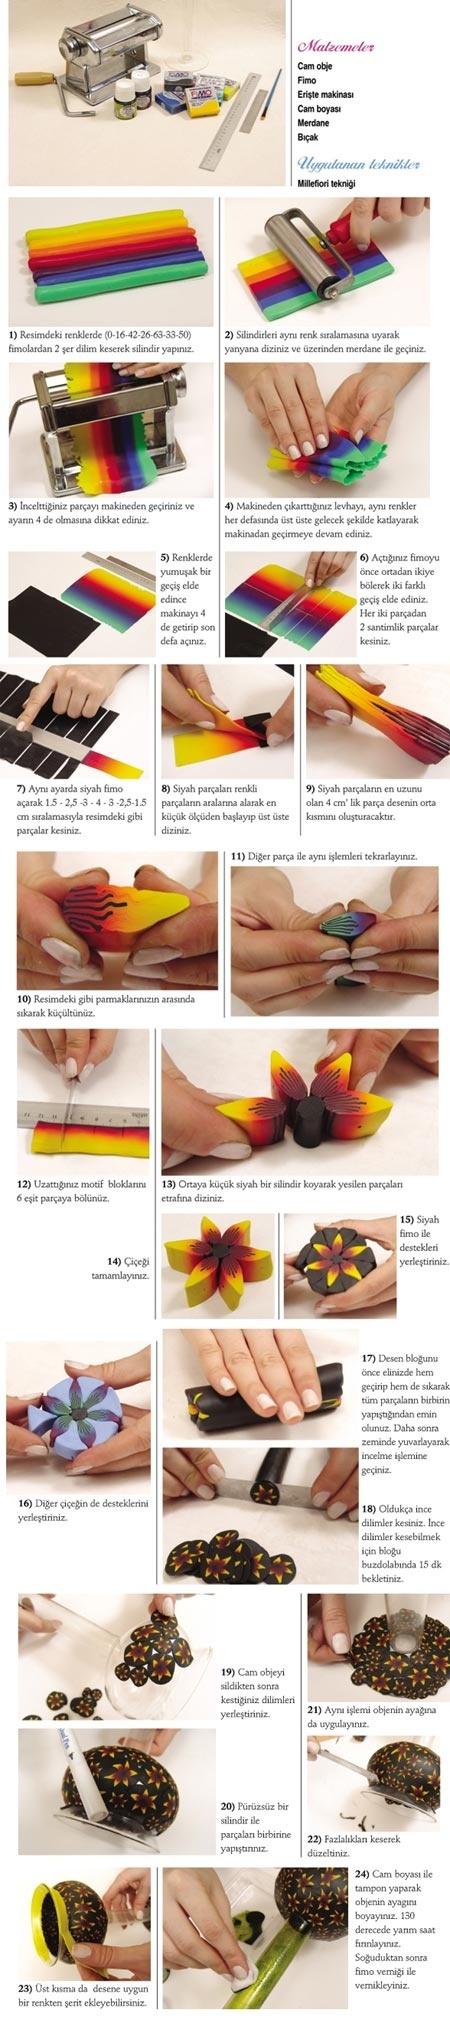 Polymer clay photo tutorials